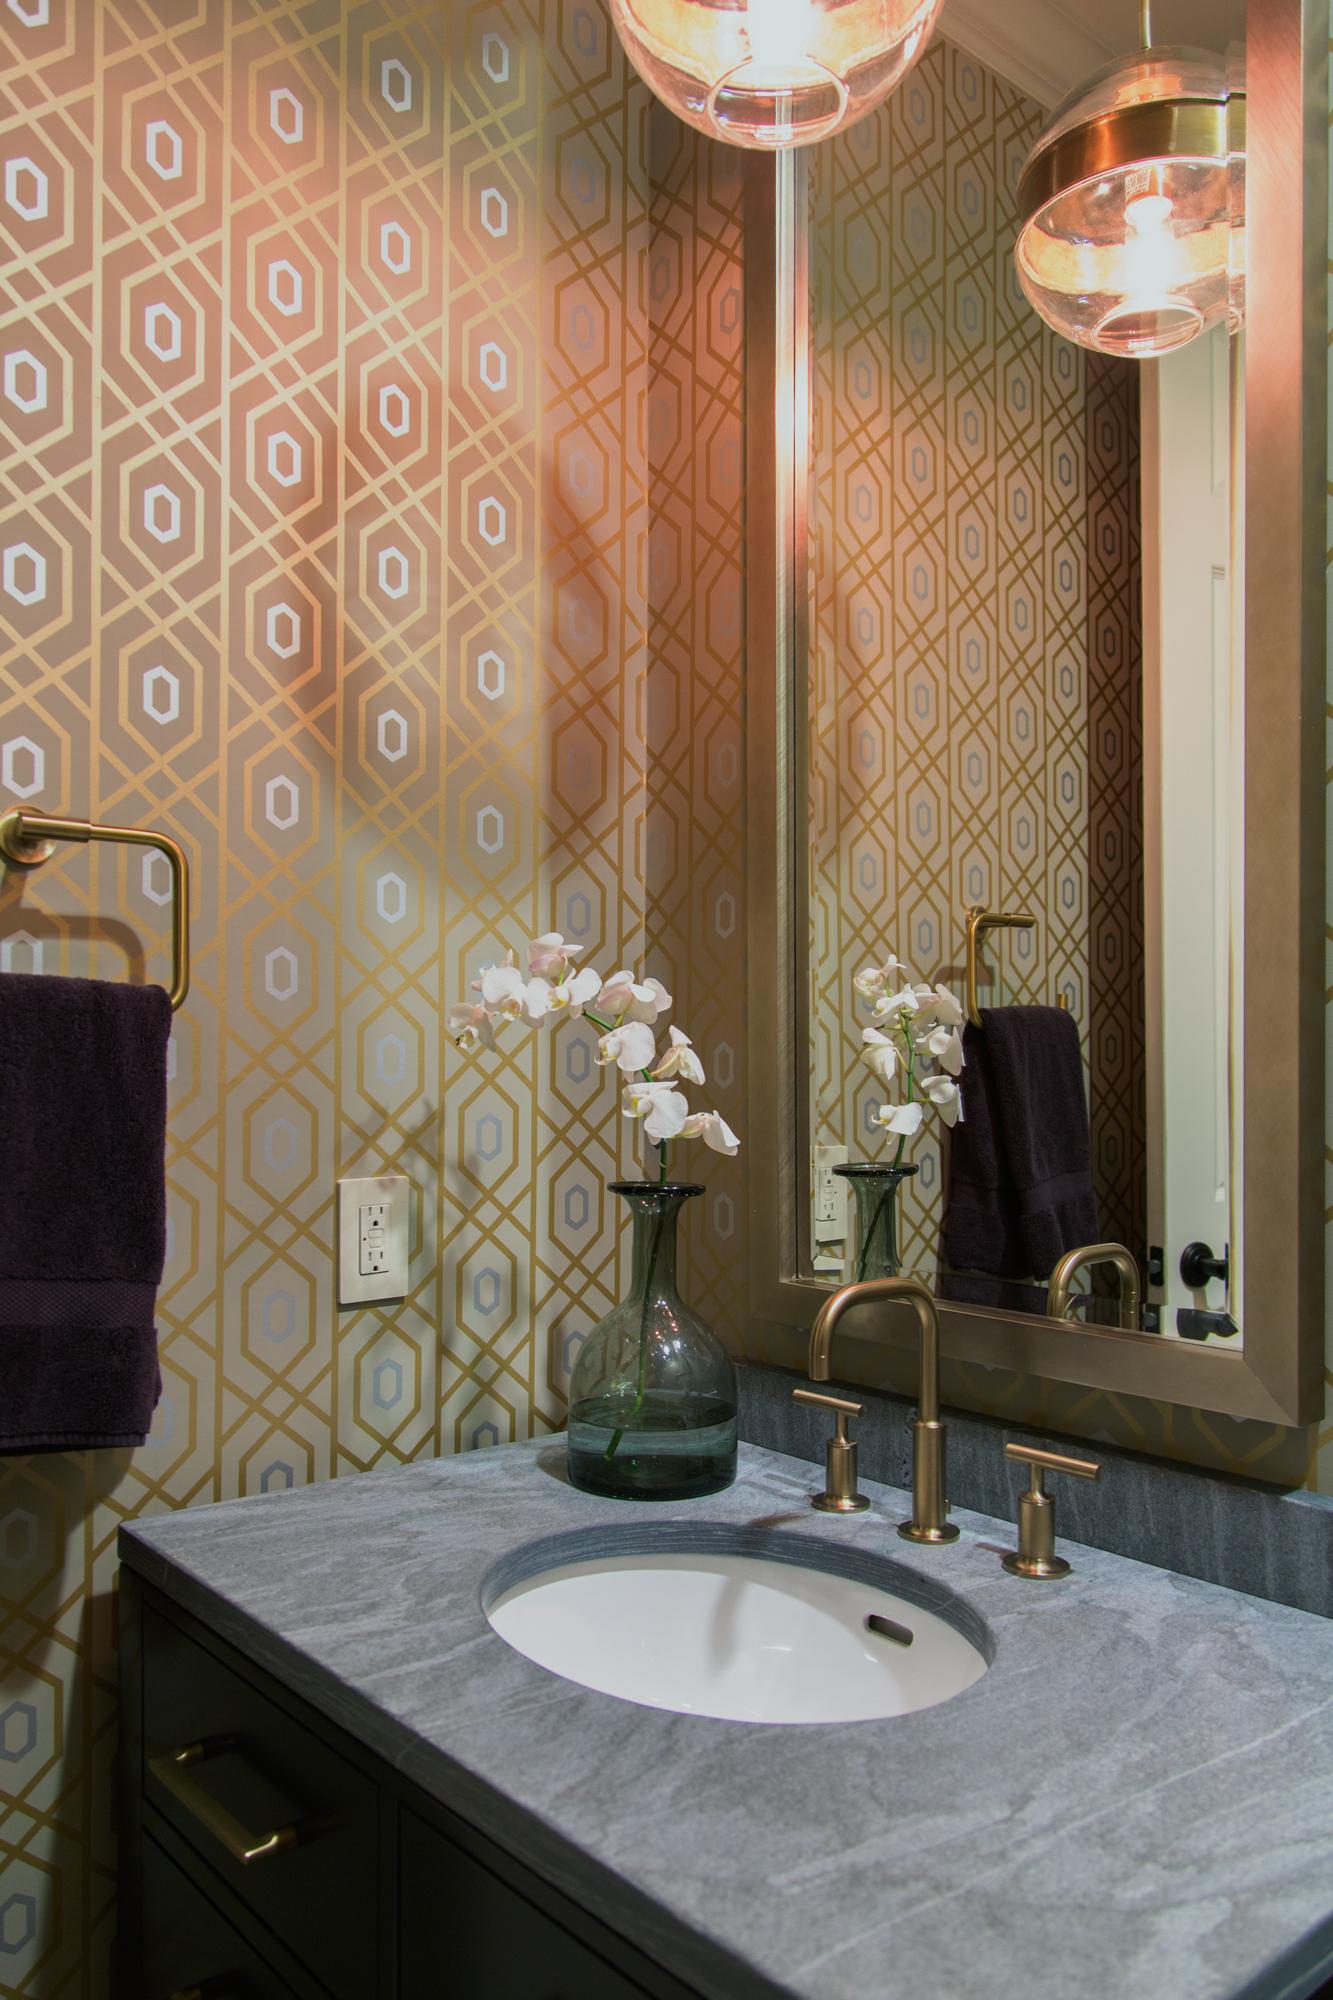 POWDER BATH ROUND UP |Powder room remodel with metallic wallpaper and pendant light fixture reflected in mirror featured in  this home's remodel  | Designer: Carla Aston, Photographer: Tori Aston #powderbath #powderroom